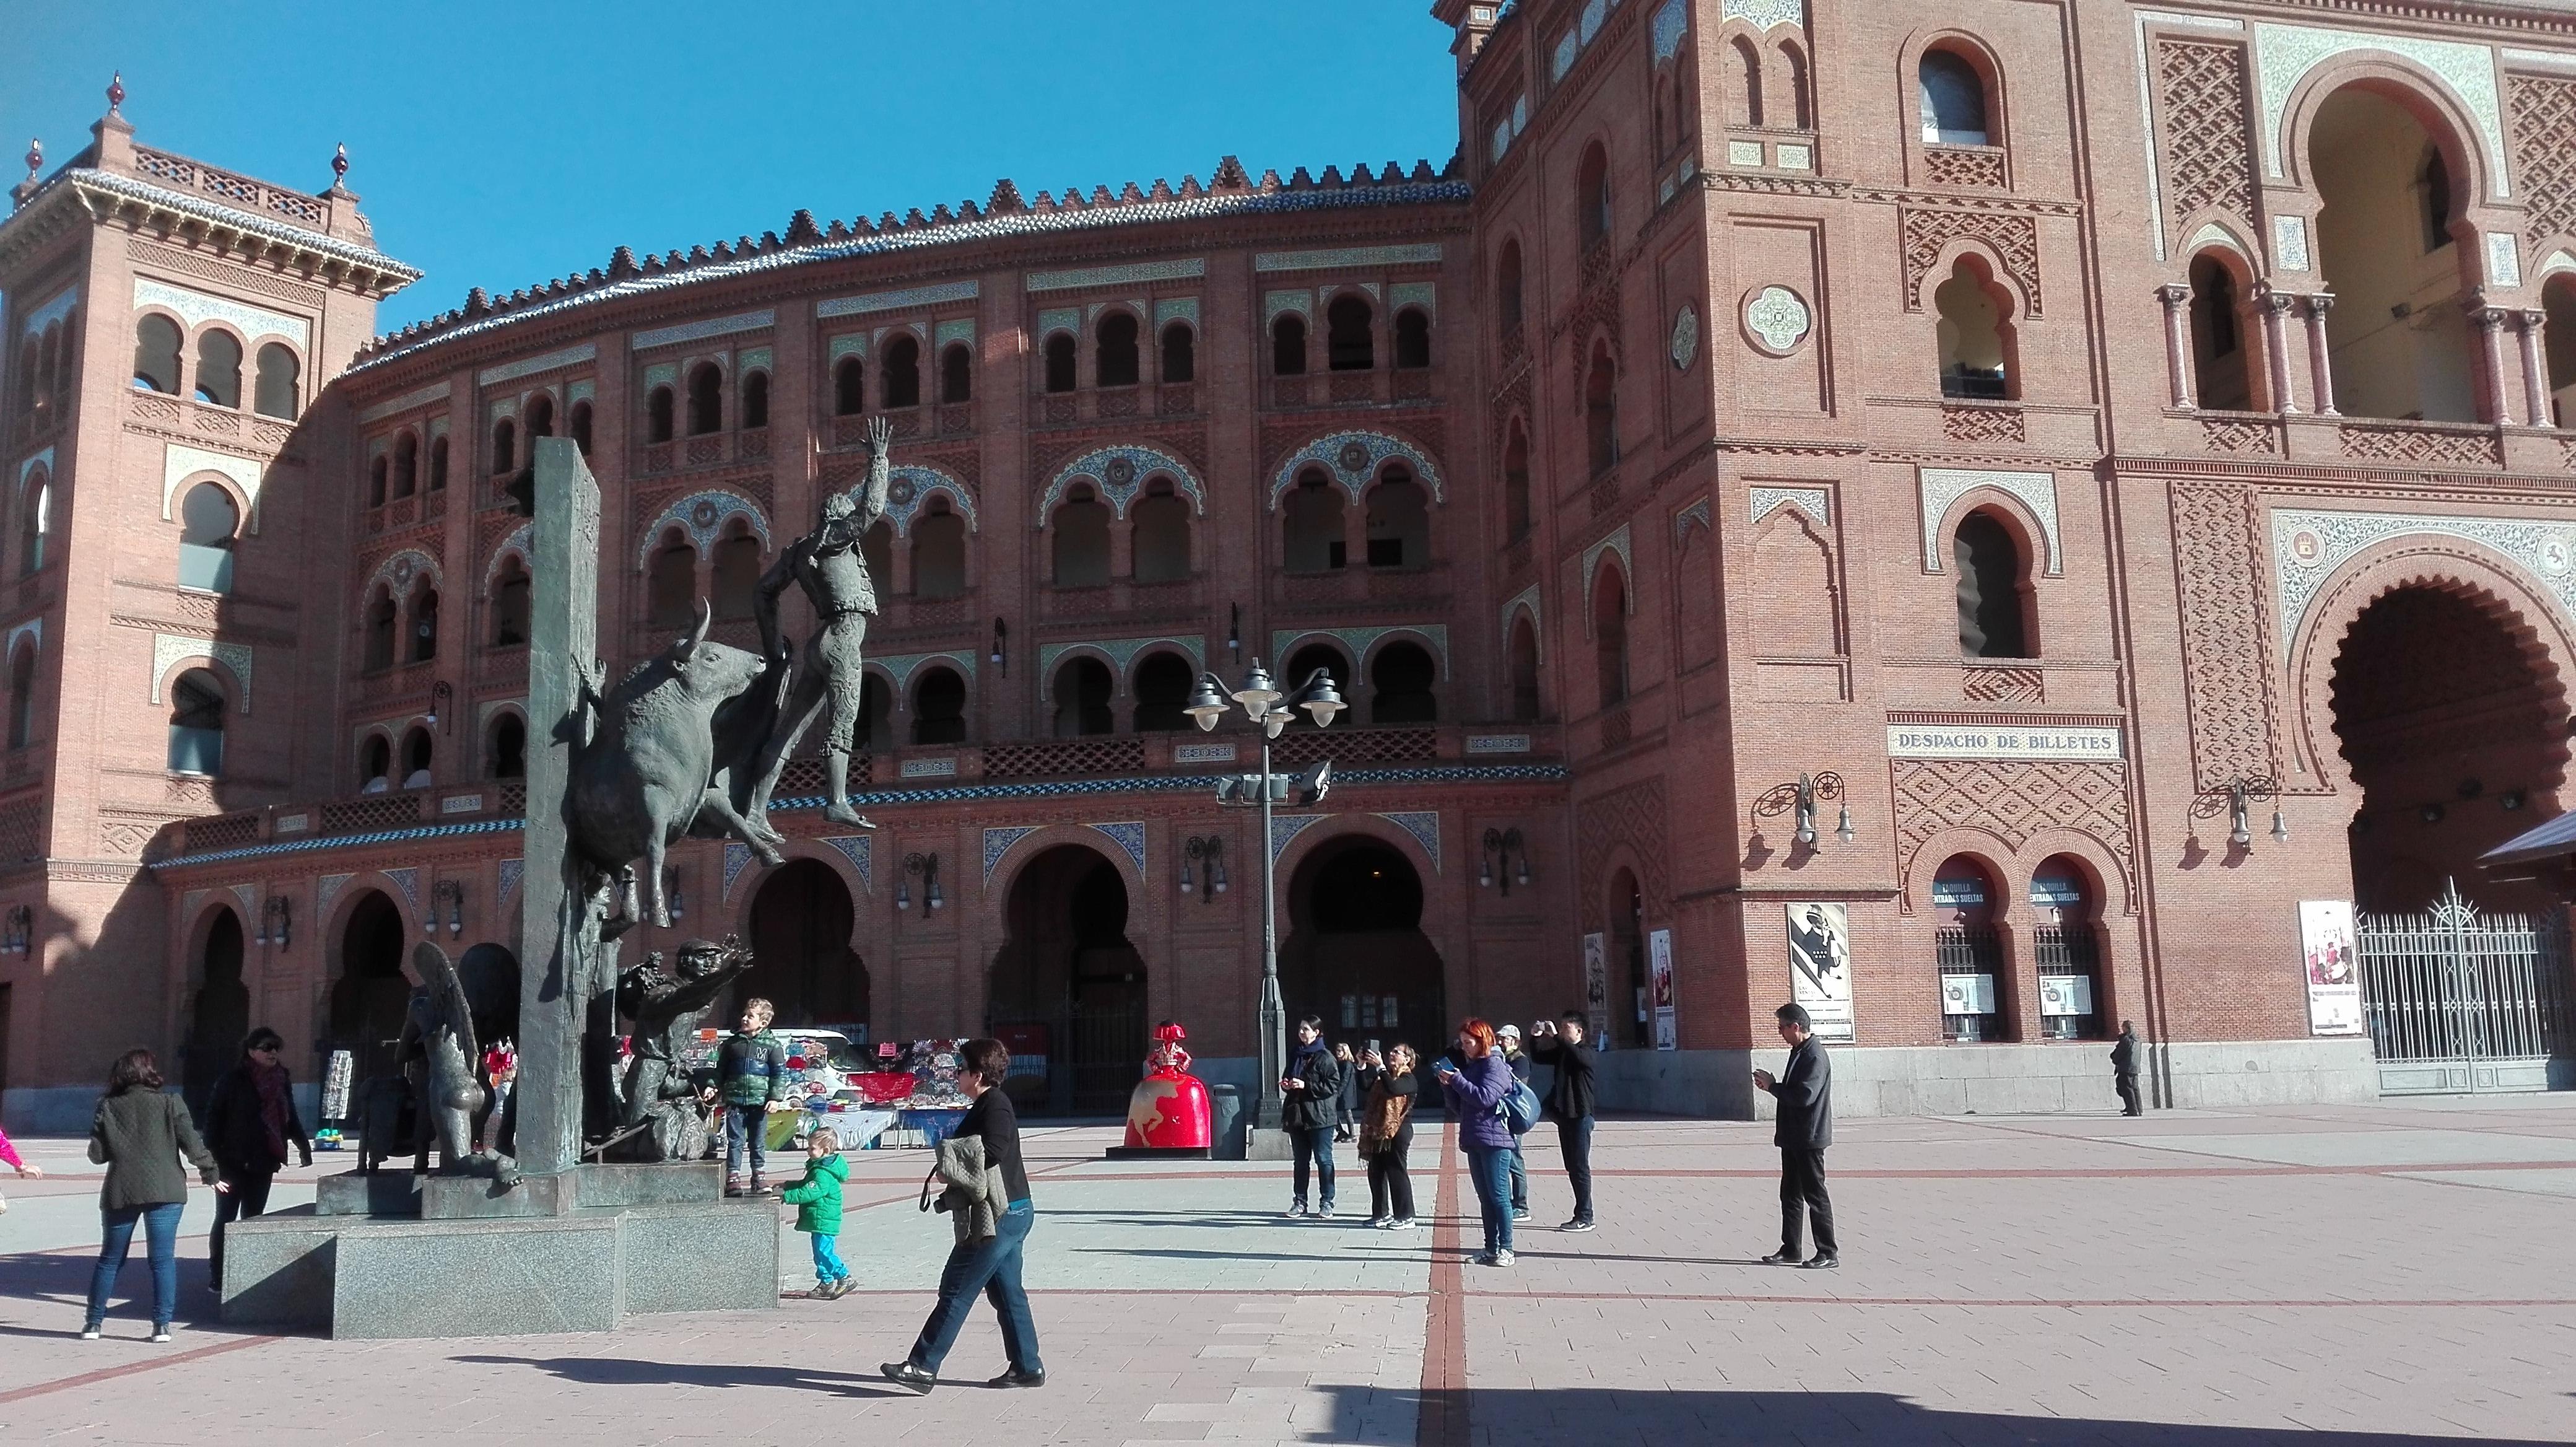 [cml_media_alt id='14650']Vacanza a Madrid in famiglia[/cml_media_alt]